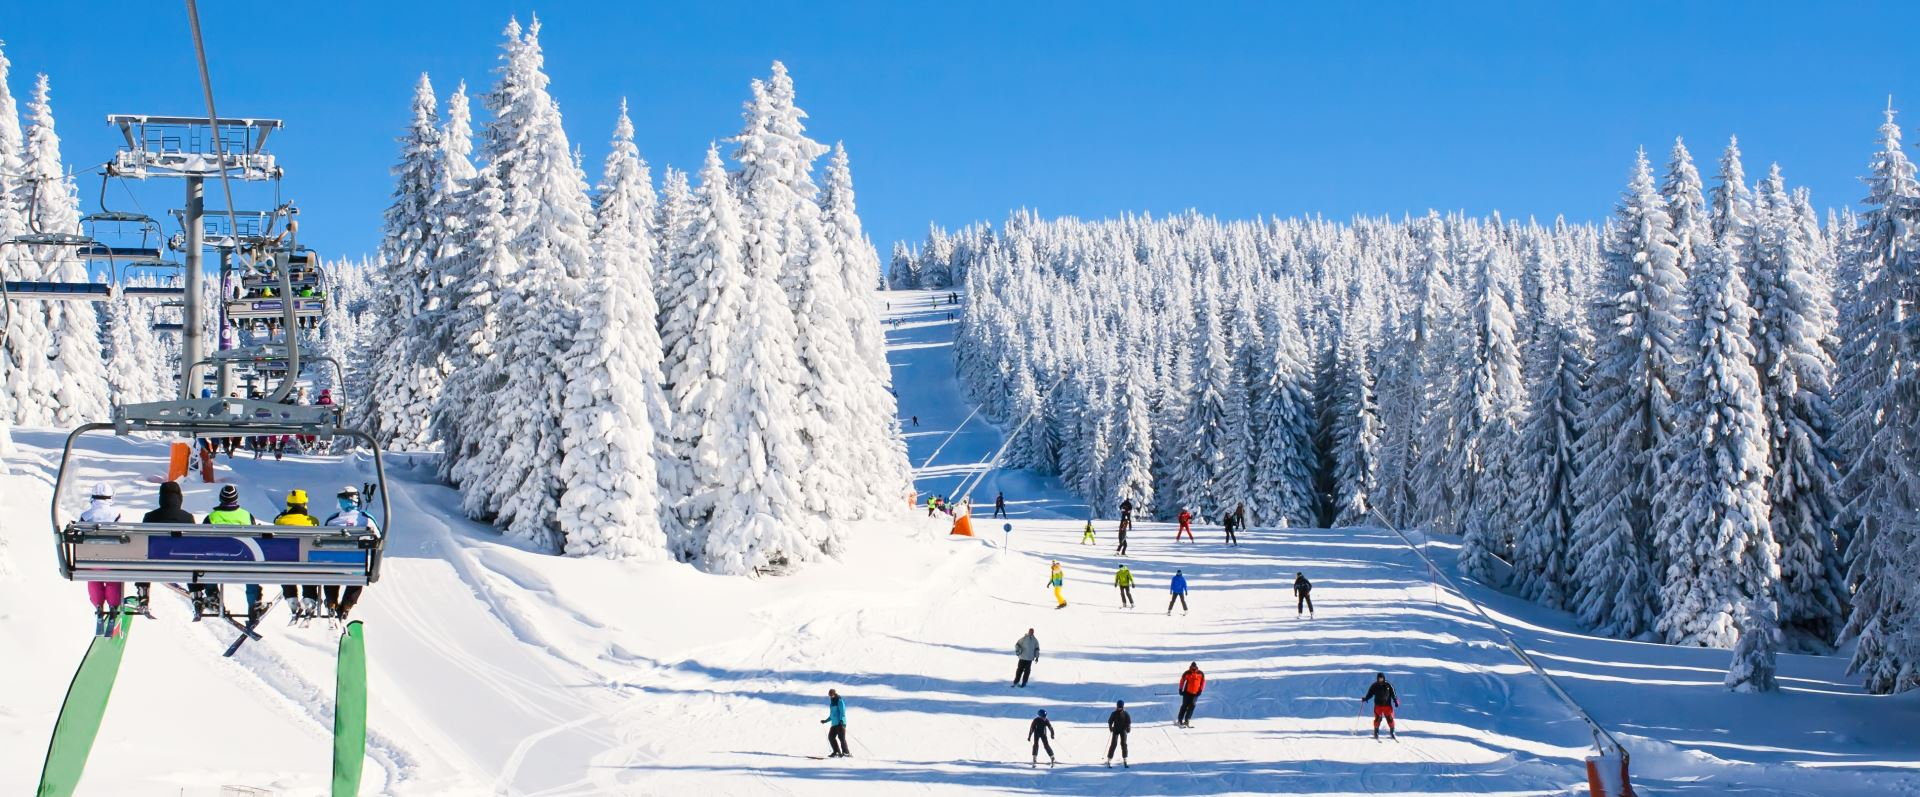 Keystone Resort Skiiers